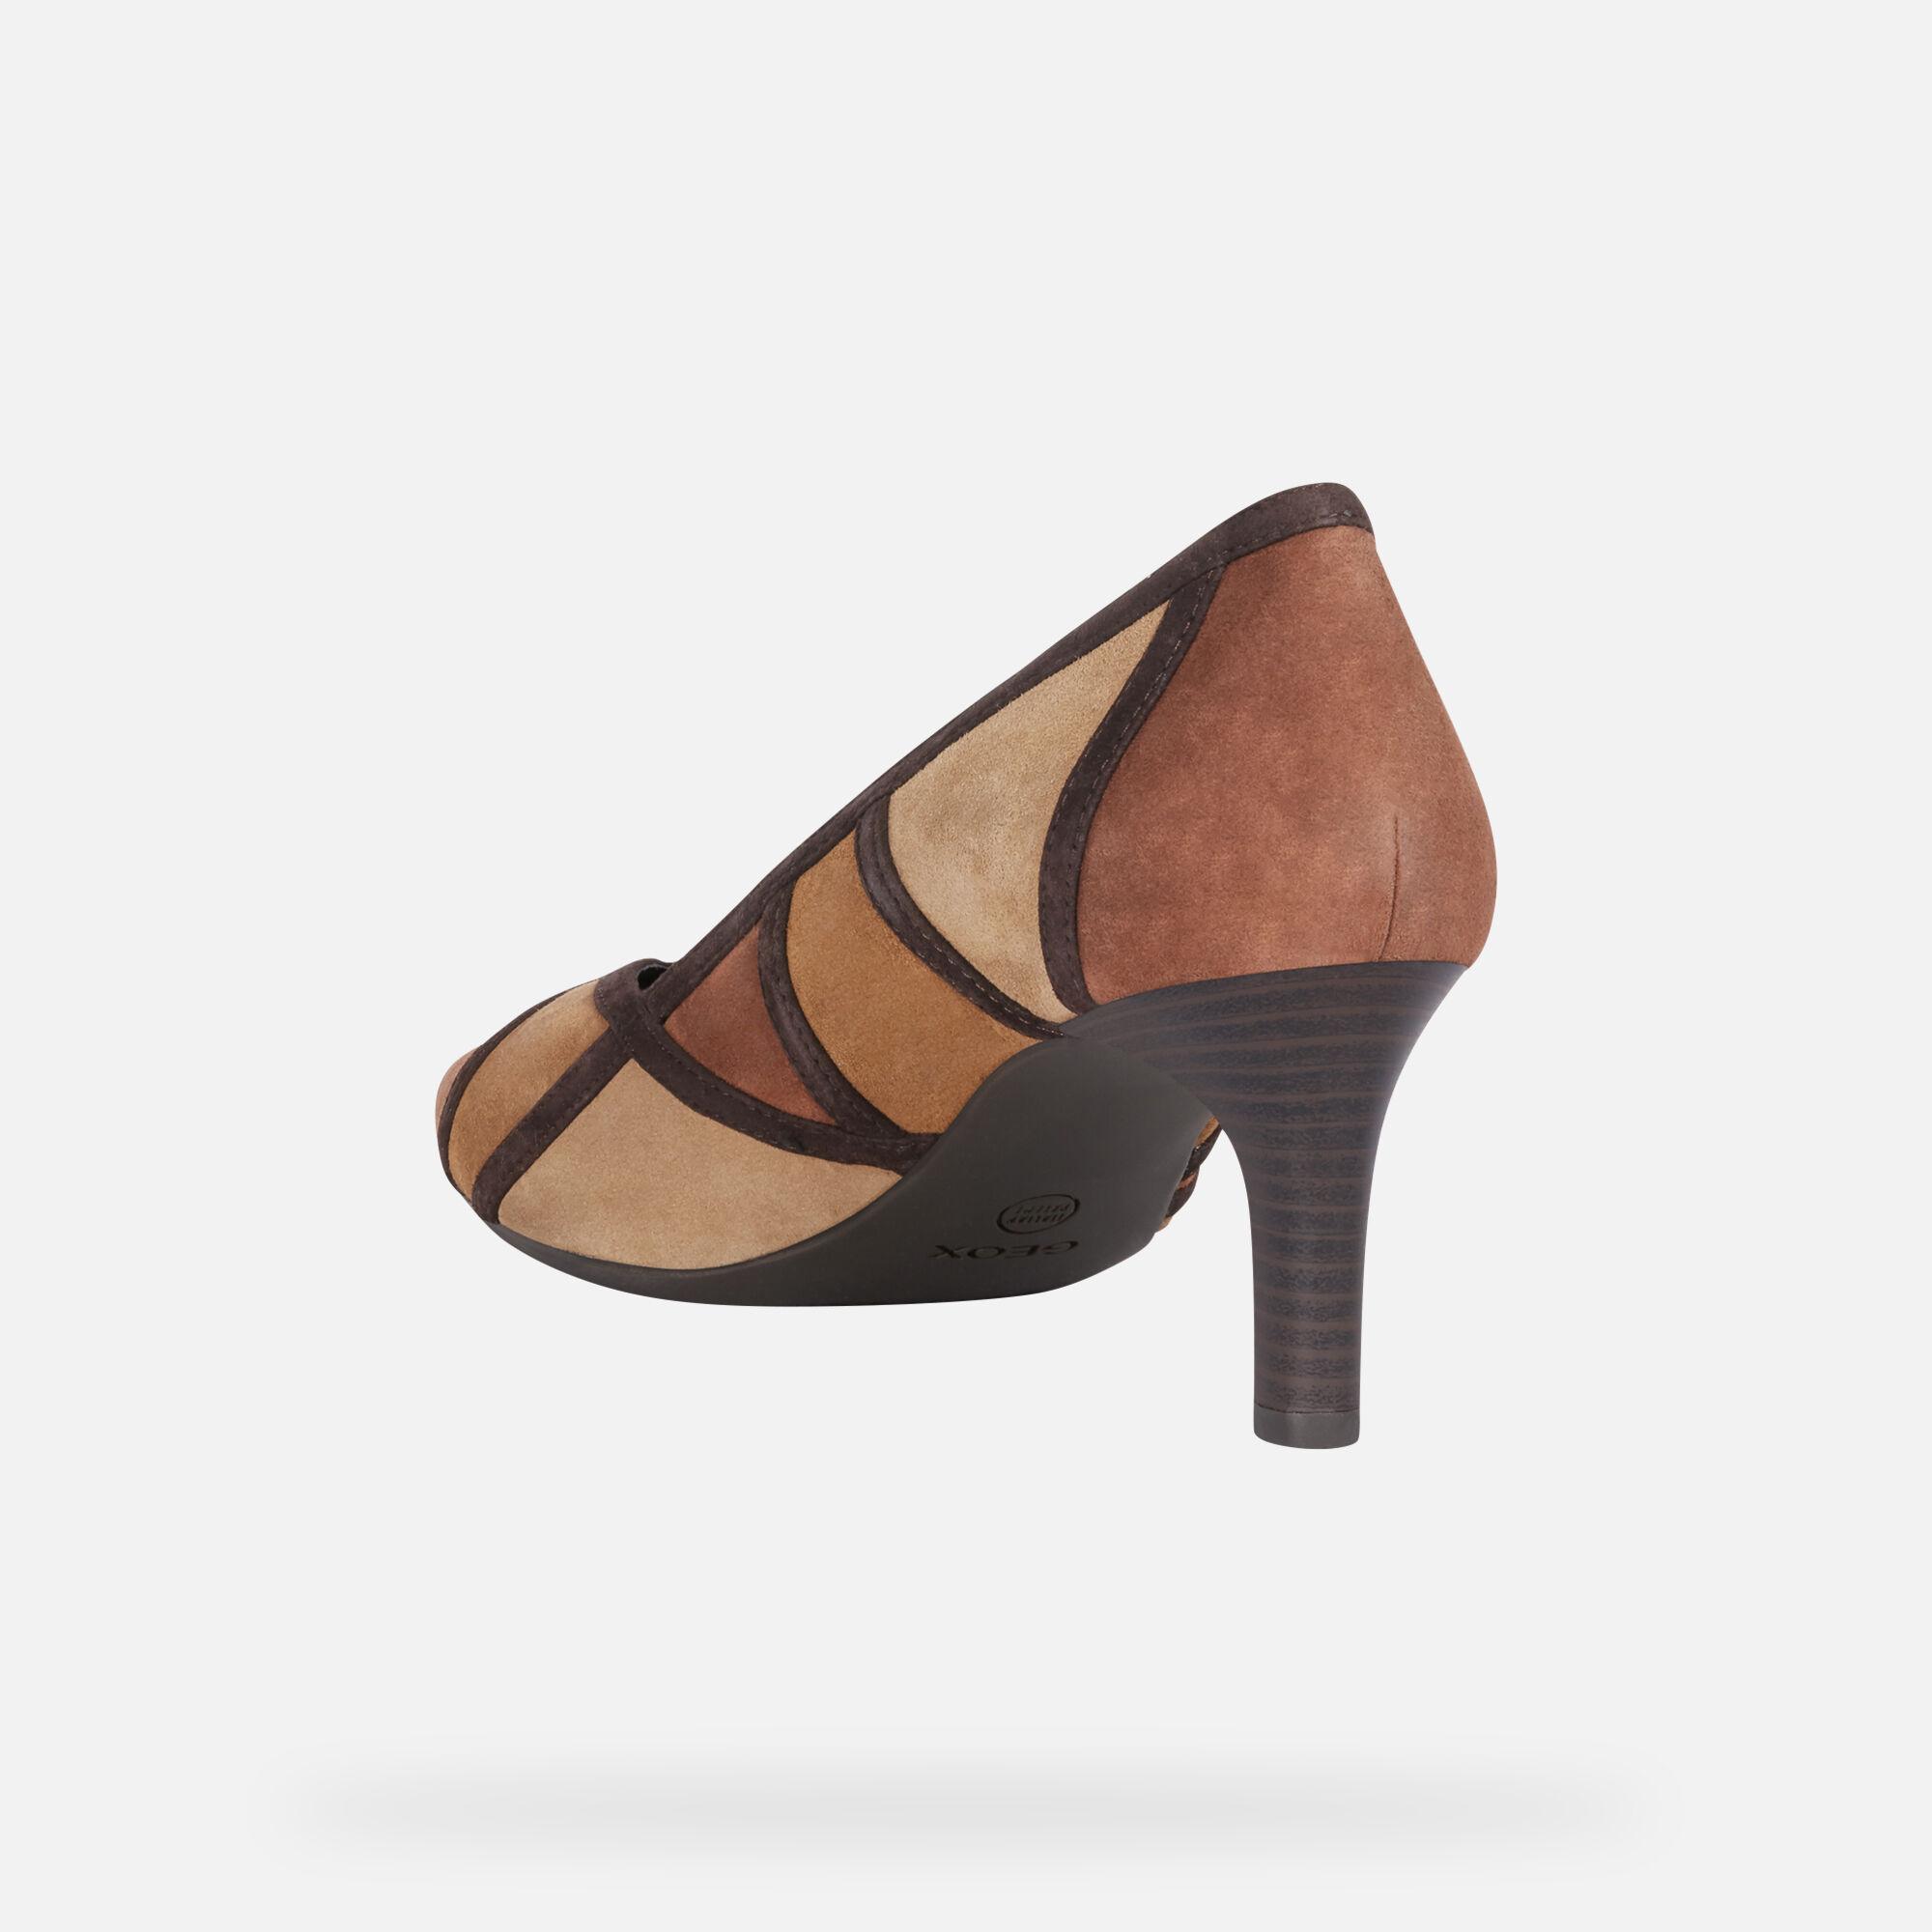 Geox BIBBIANA Donna: Scarpe con tacco Ruggine   Geox ®